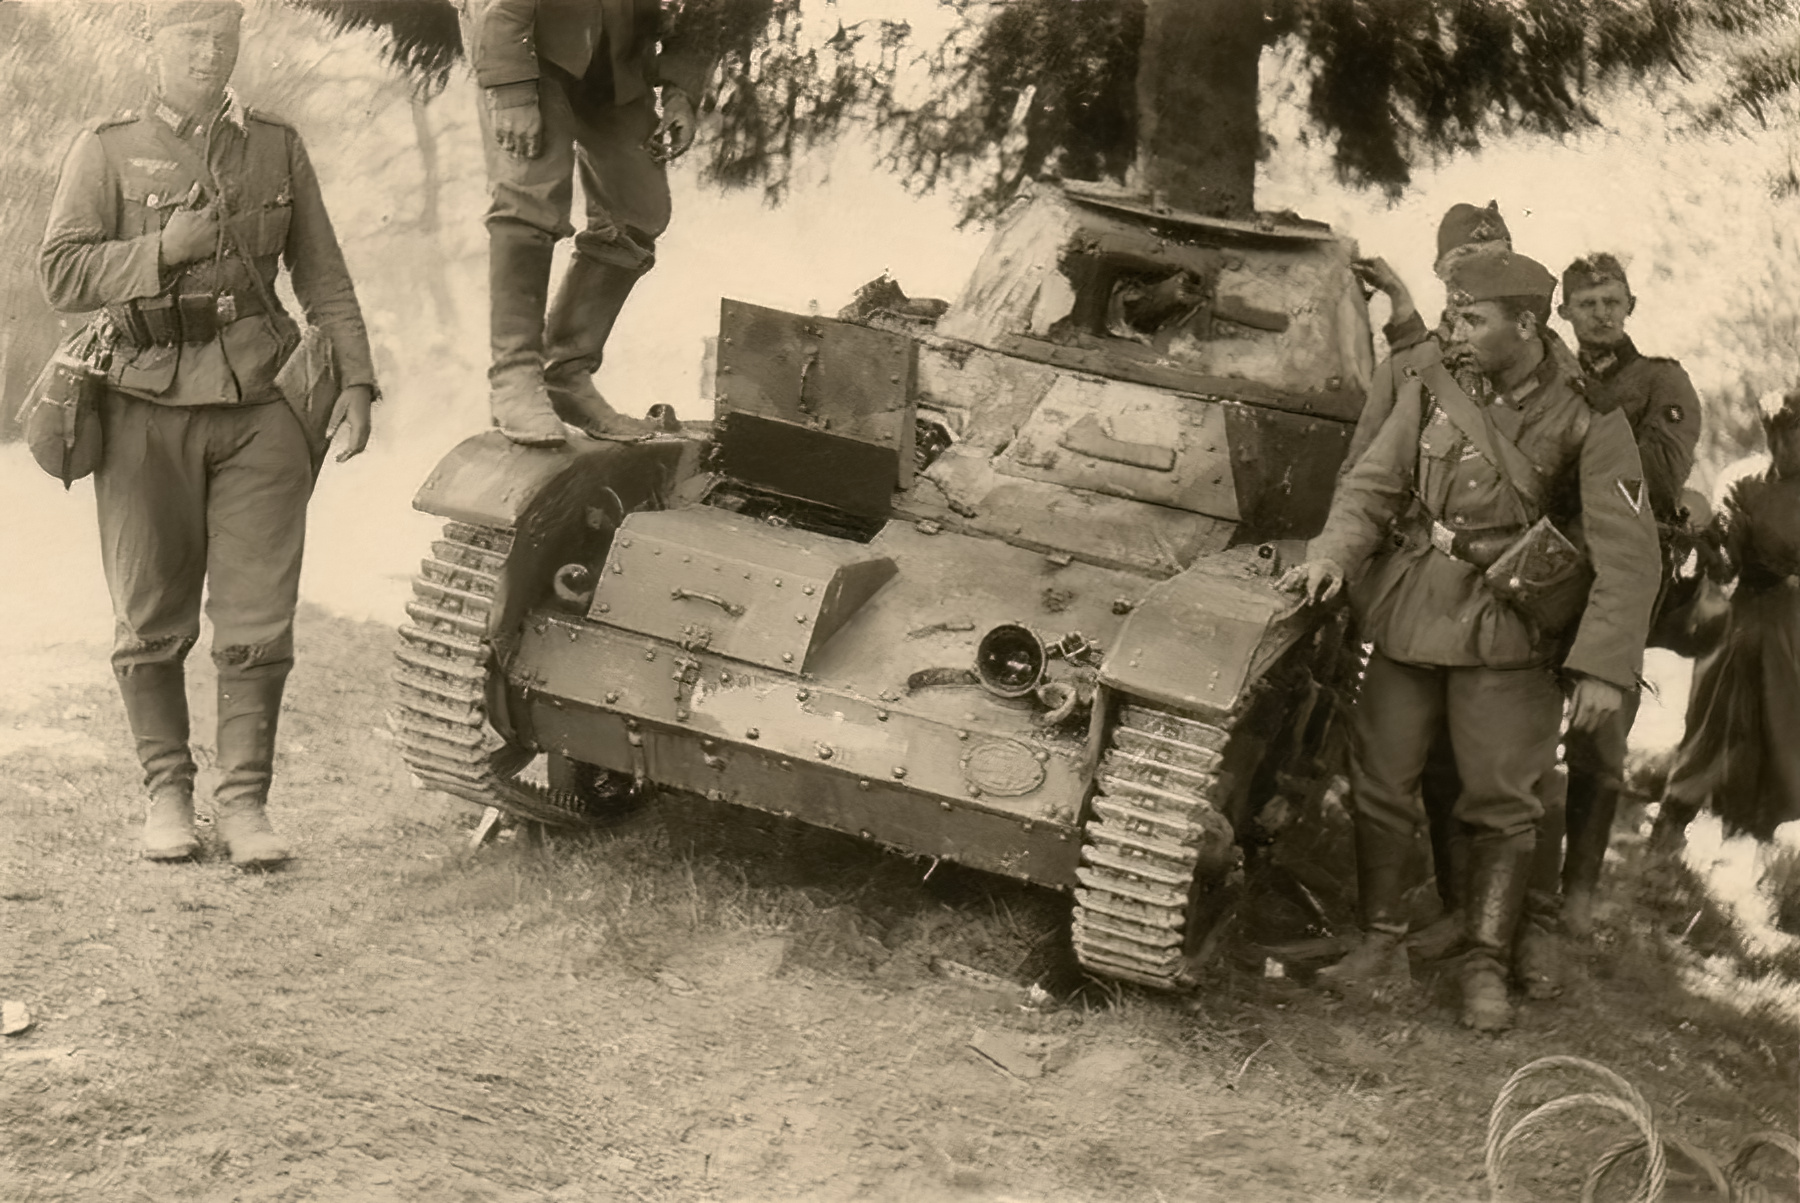 French Army Renault AMR captured battle of France 1940 ebay 01